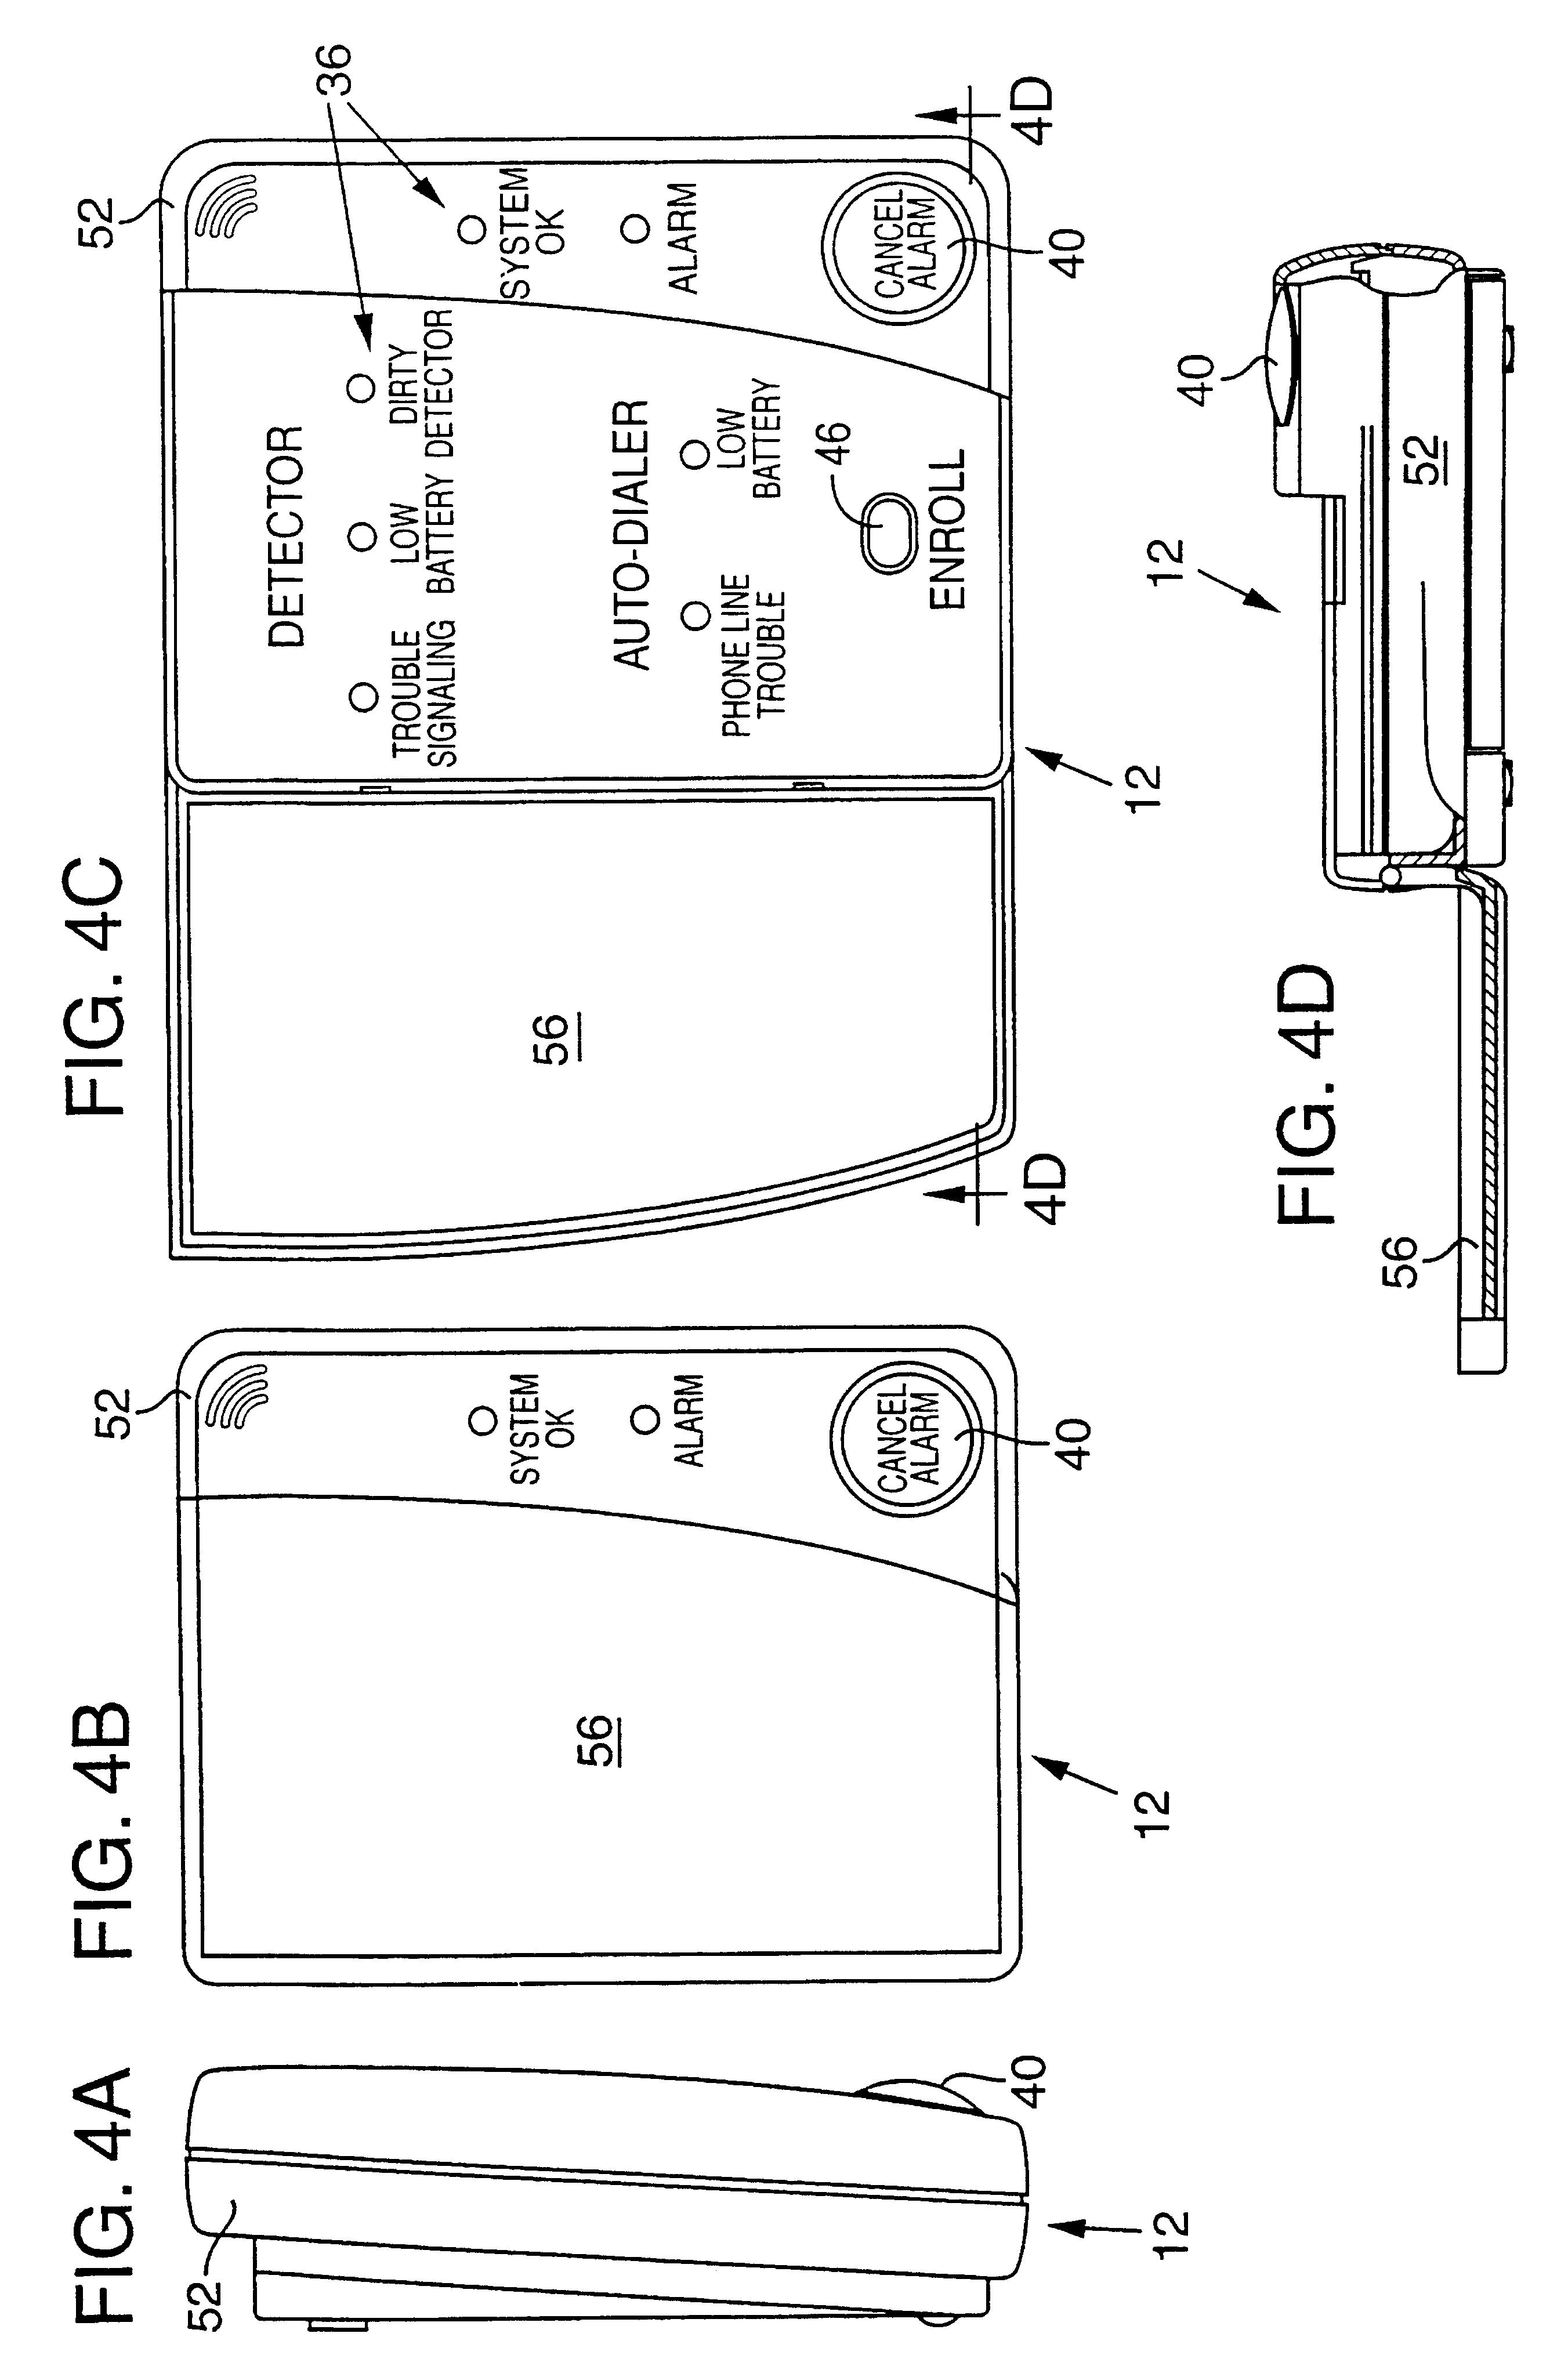 Tyco Smoke Detector Wiring Diagram : 34 Wiring Diagram